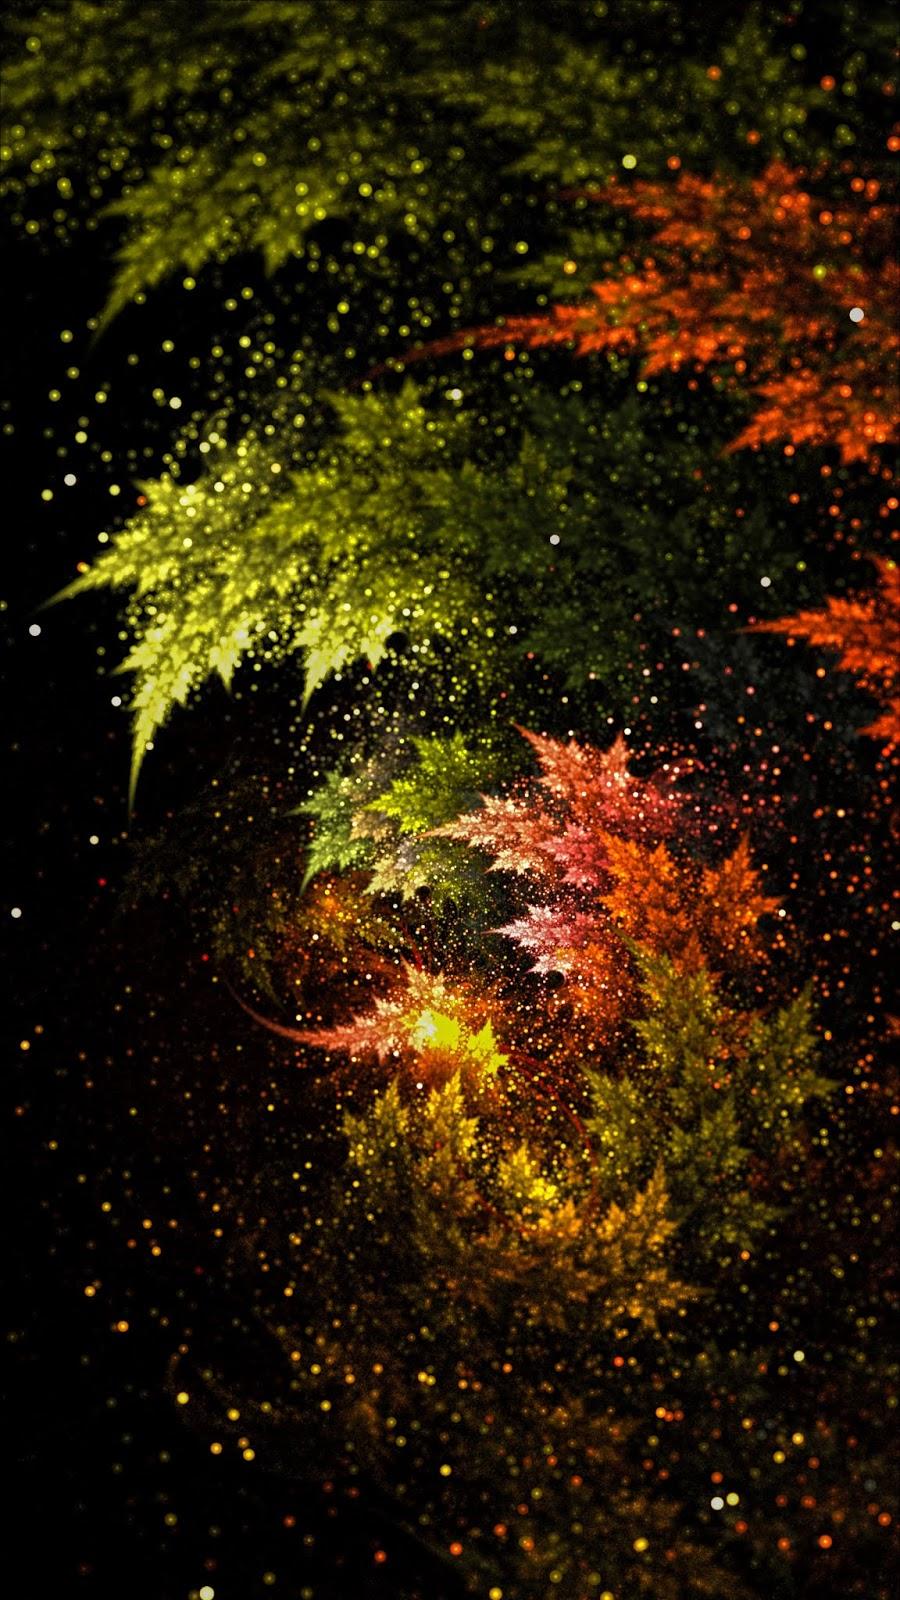 Star leaves